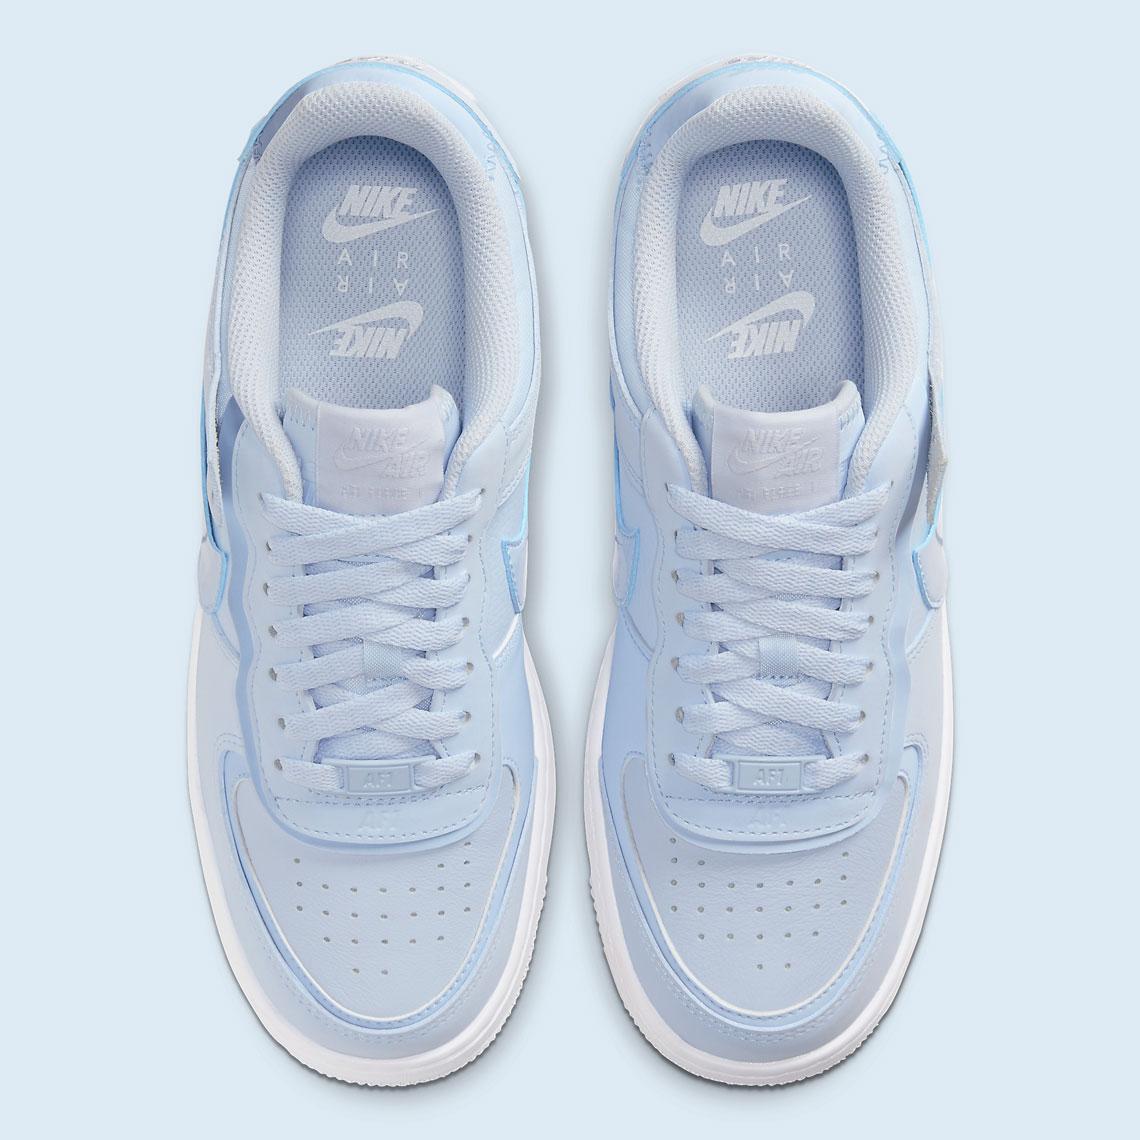 Nike Air Force 1 Shadow Hydrogren Blue CV3020-400   SneakerNews.com